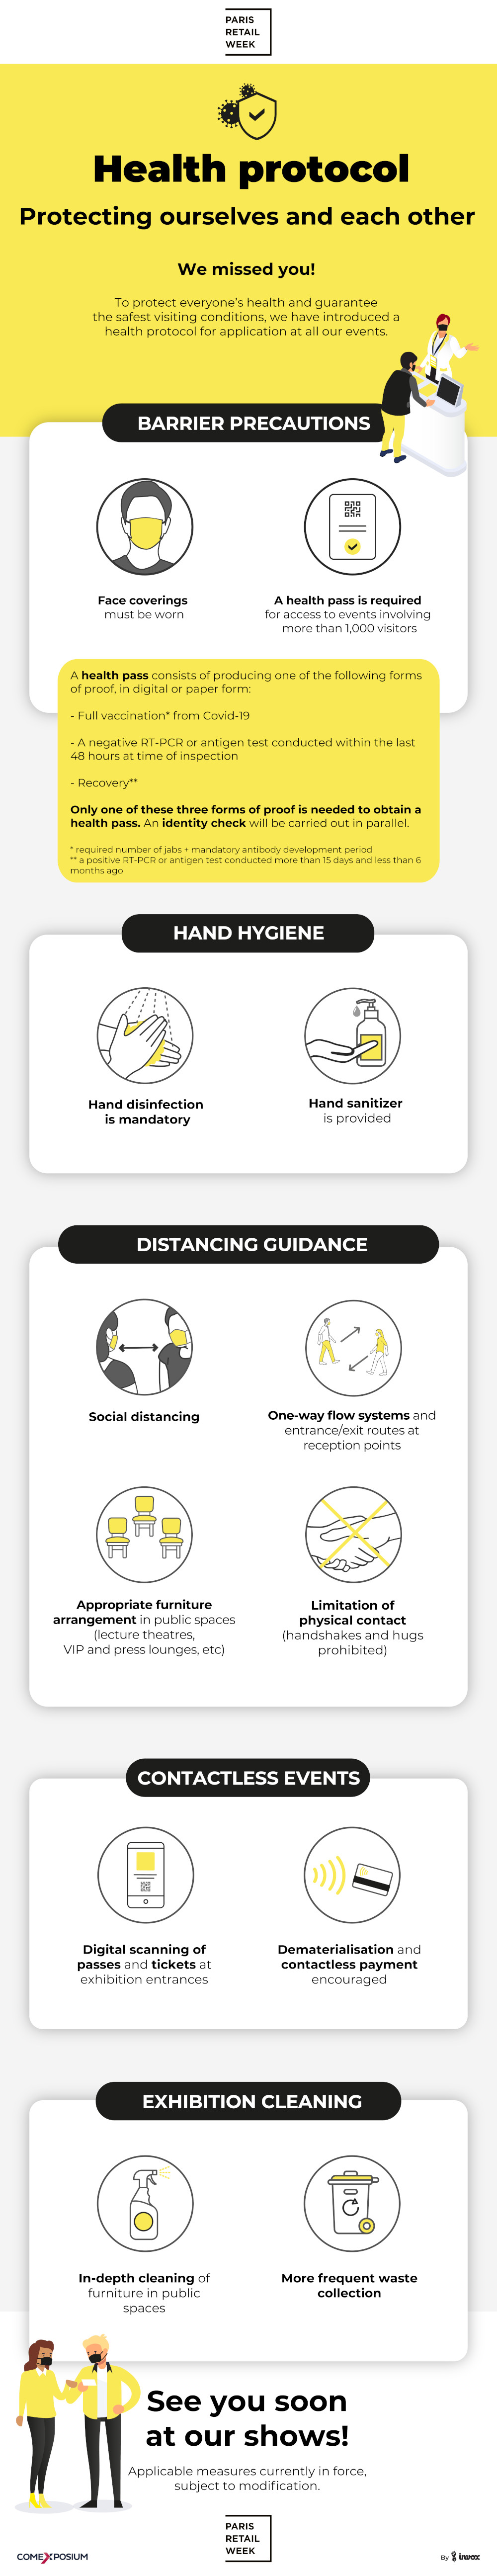 Infographic health protocol Paris Retail Week